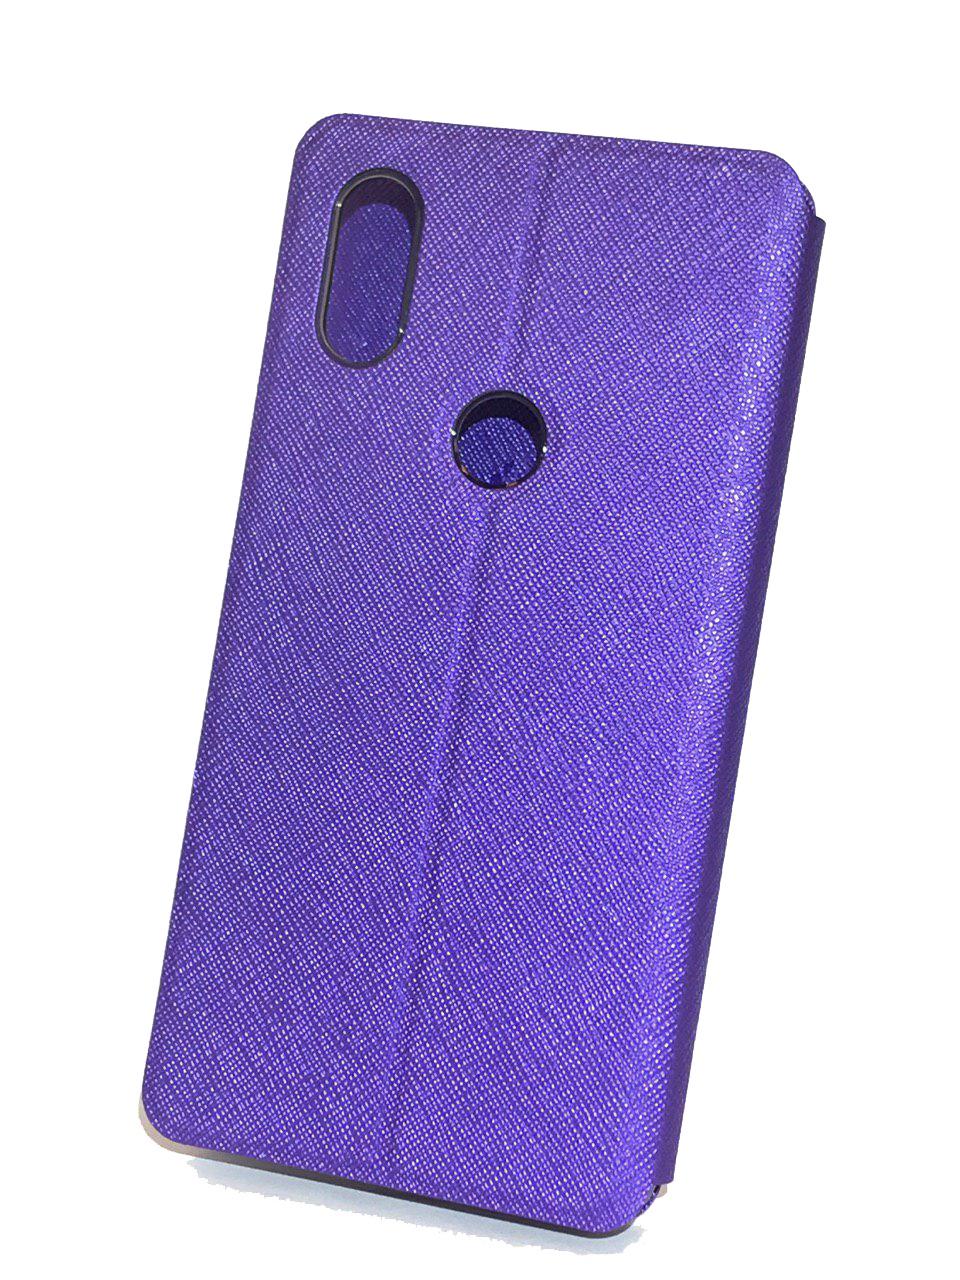 Фото - Чехол для сотового телефона Mofi Книжка Ribbed Xiaomi Redmi 6 Pro/ A2 Lite Purple, фиолетовый open shoulder ribbed tshirt